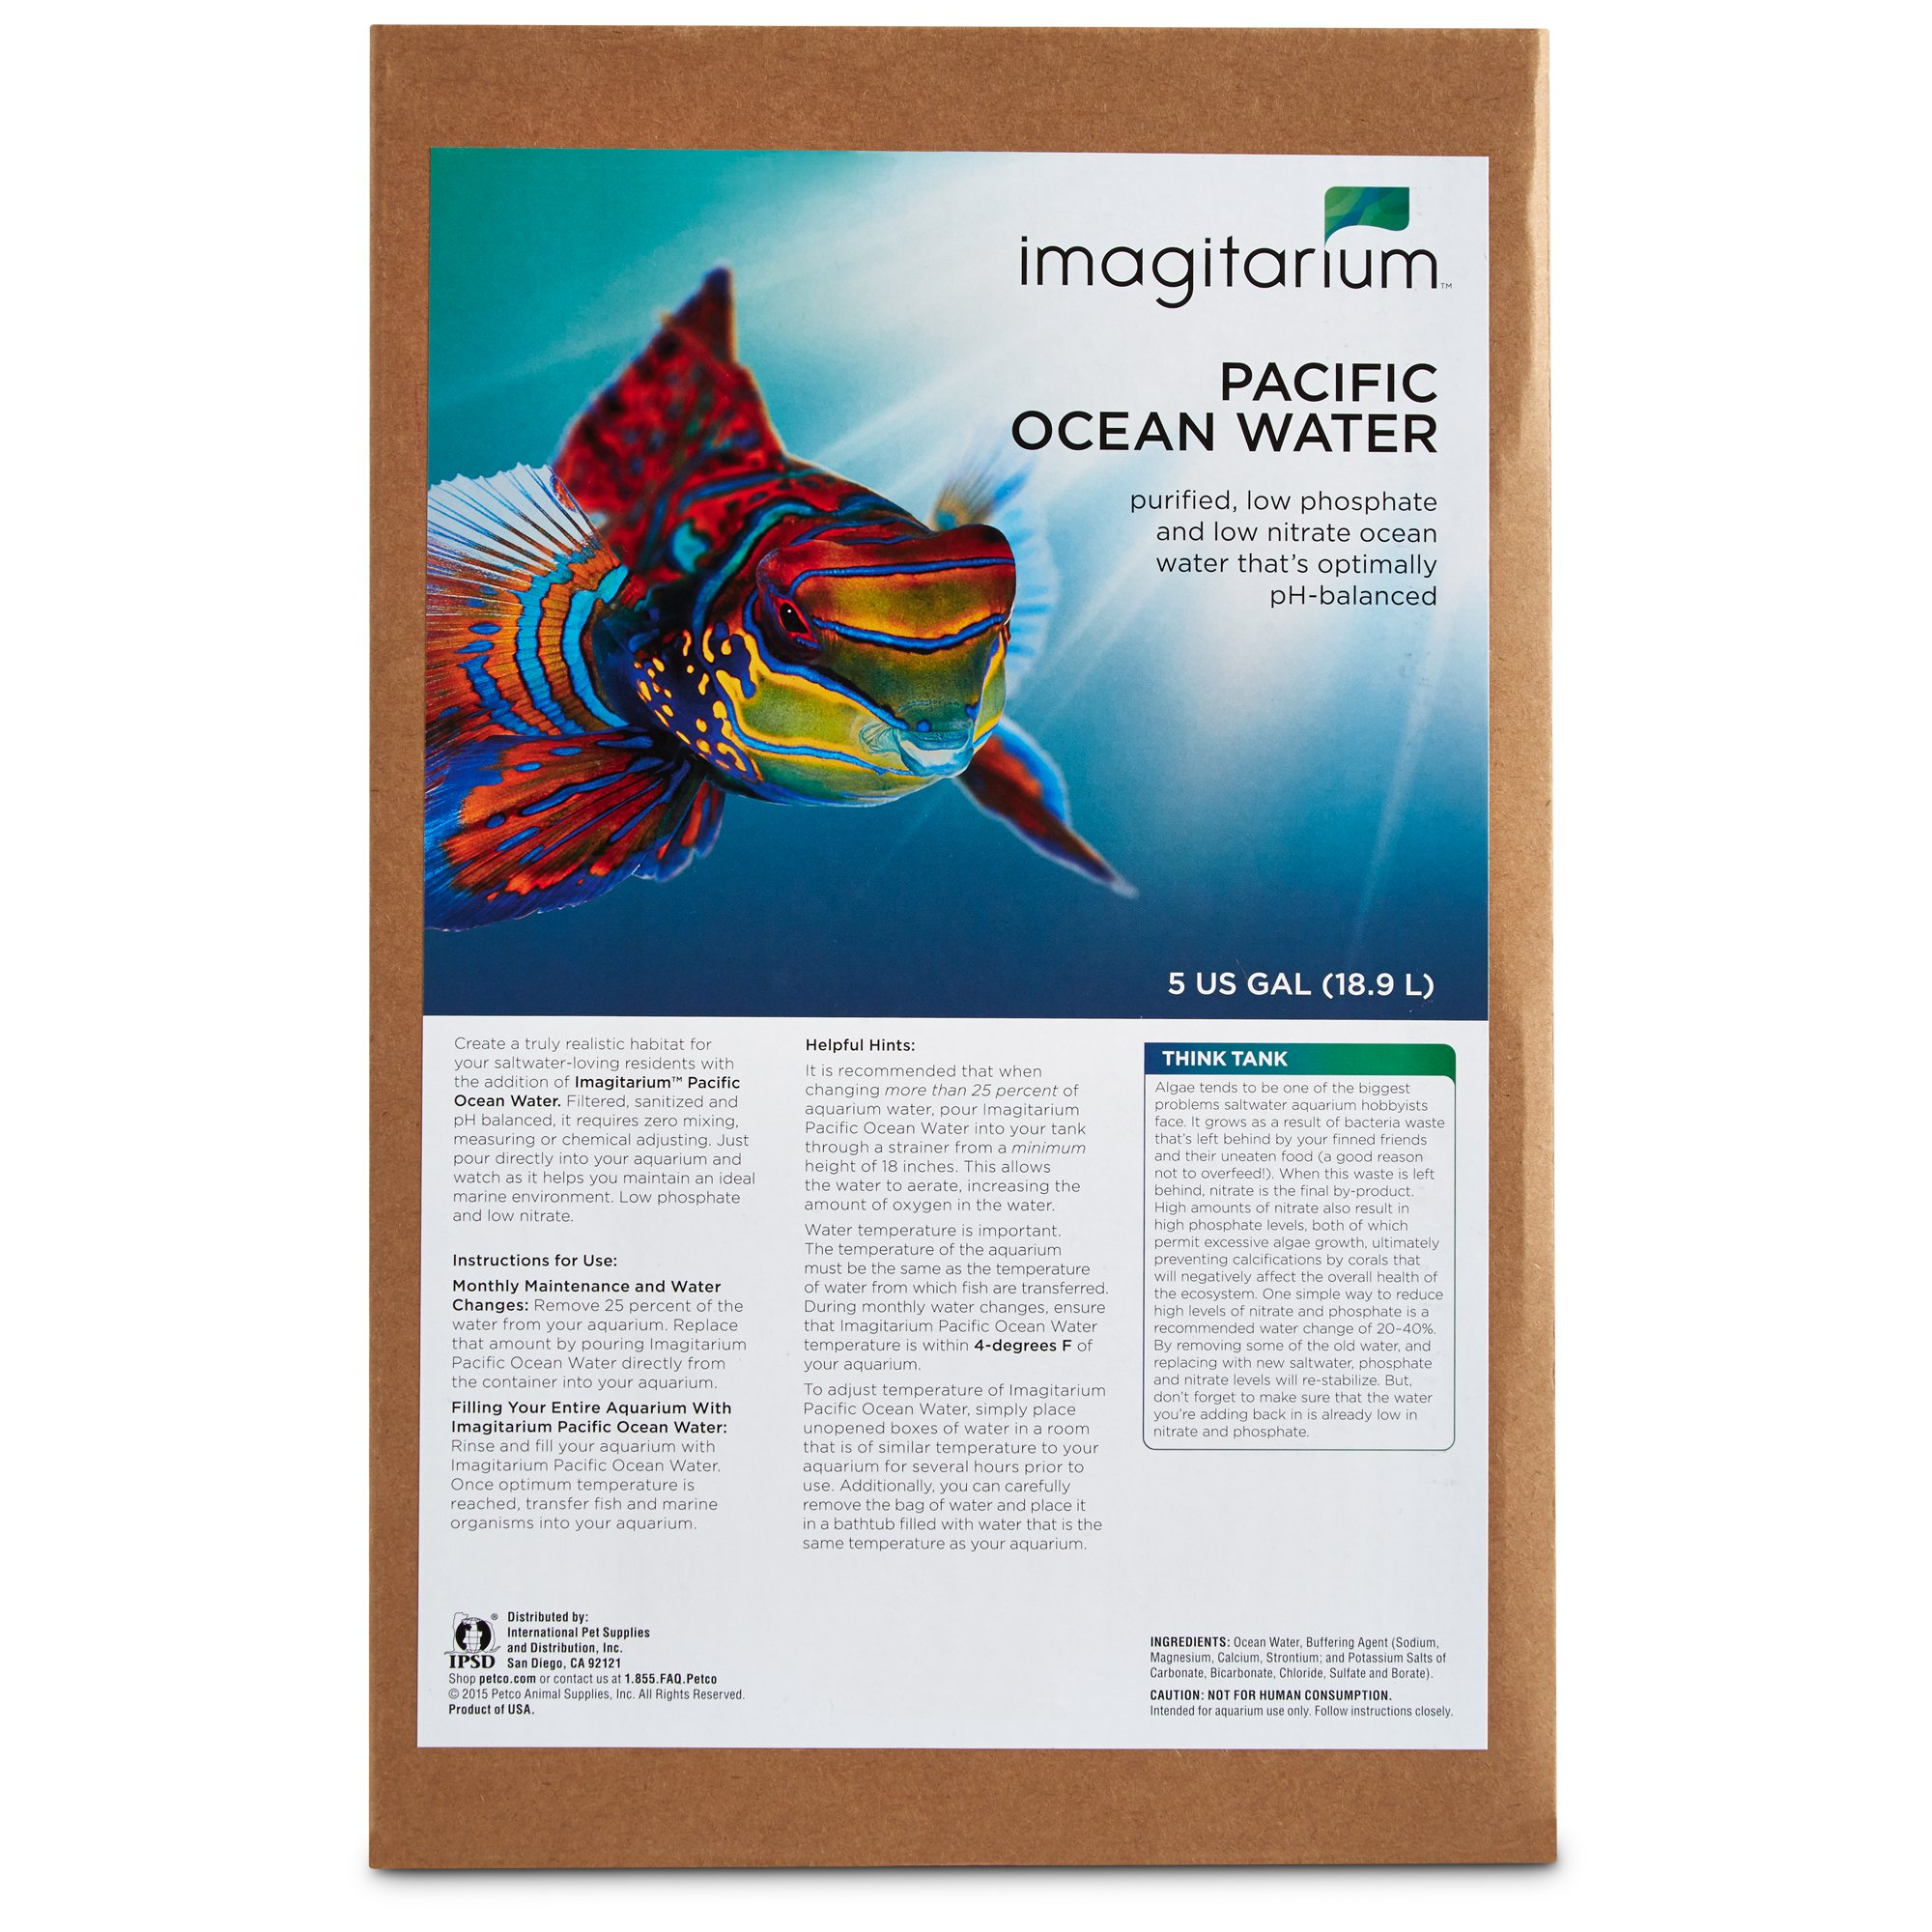 Imagitarium Pacific Ocean Water